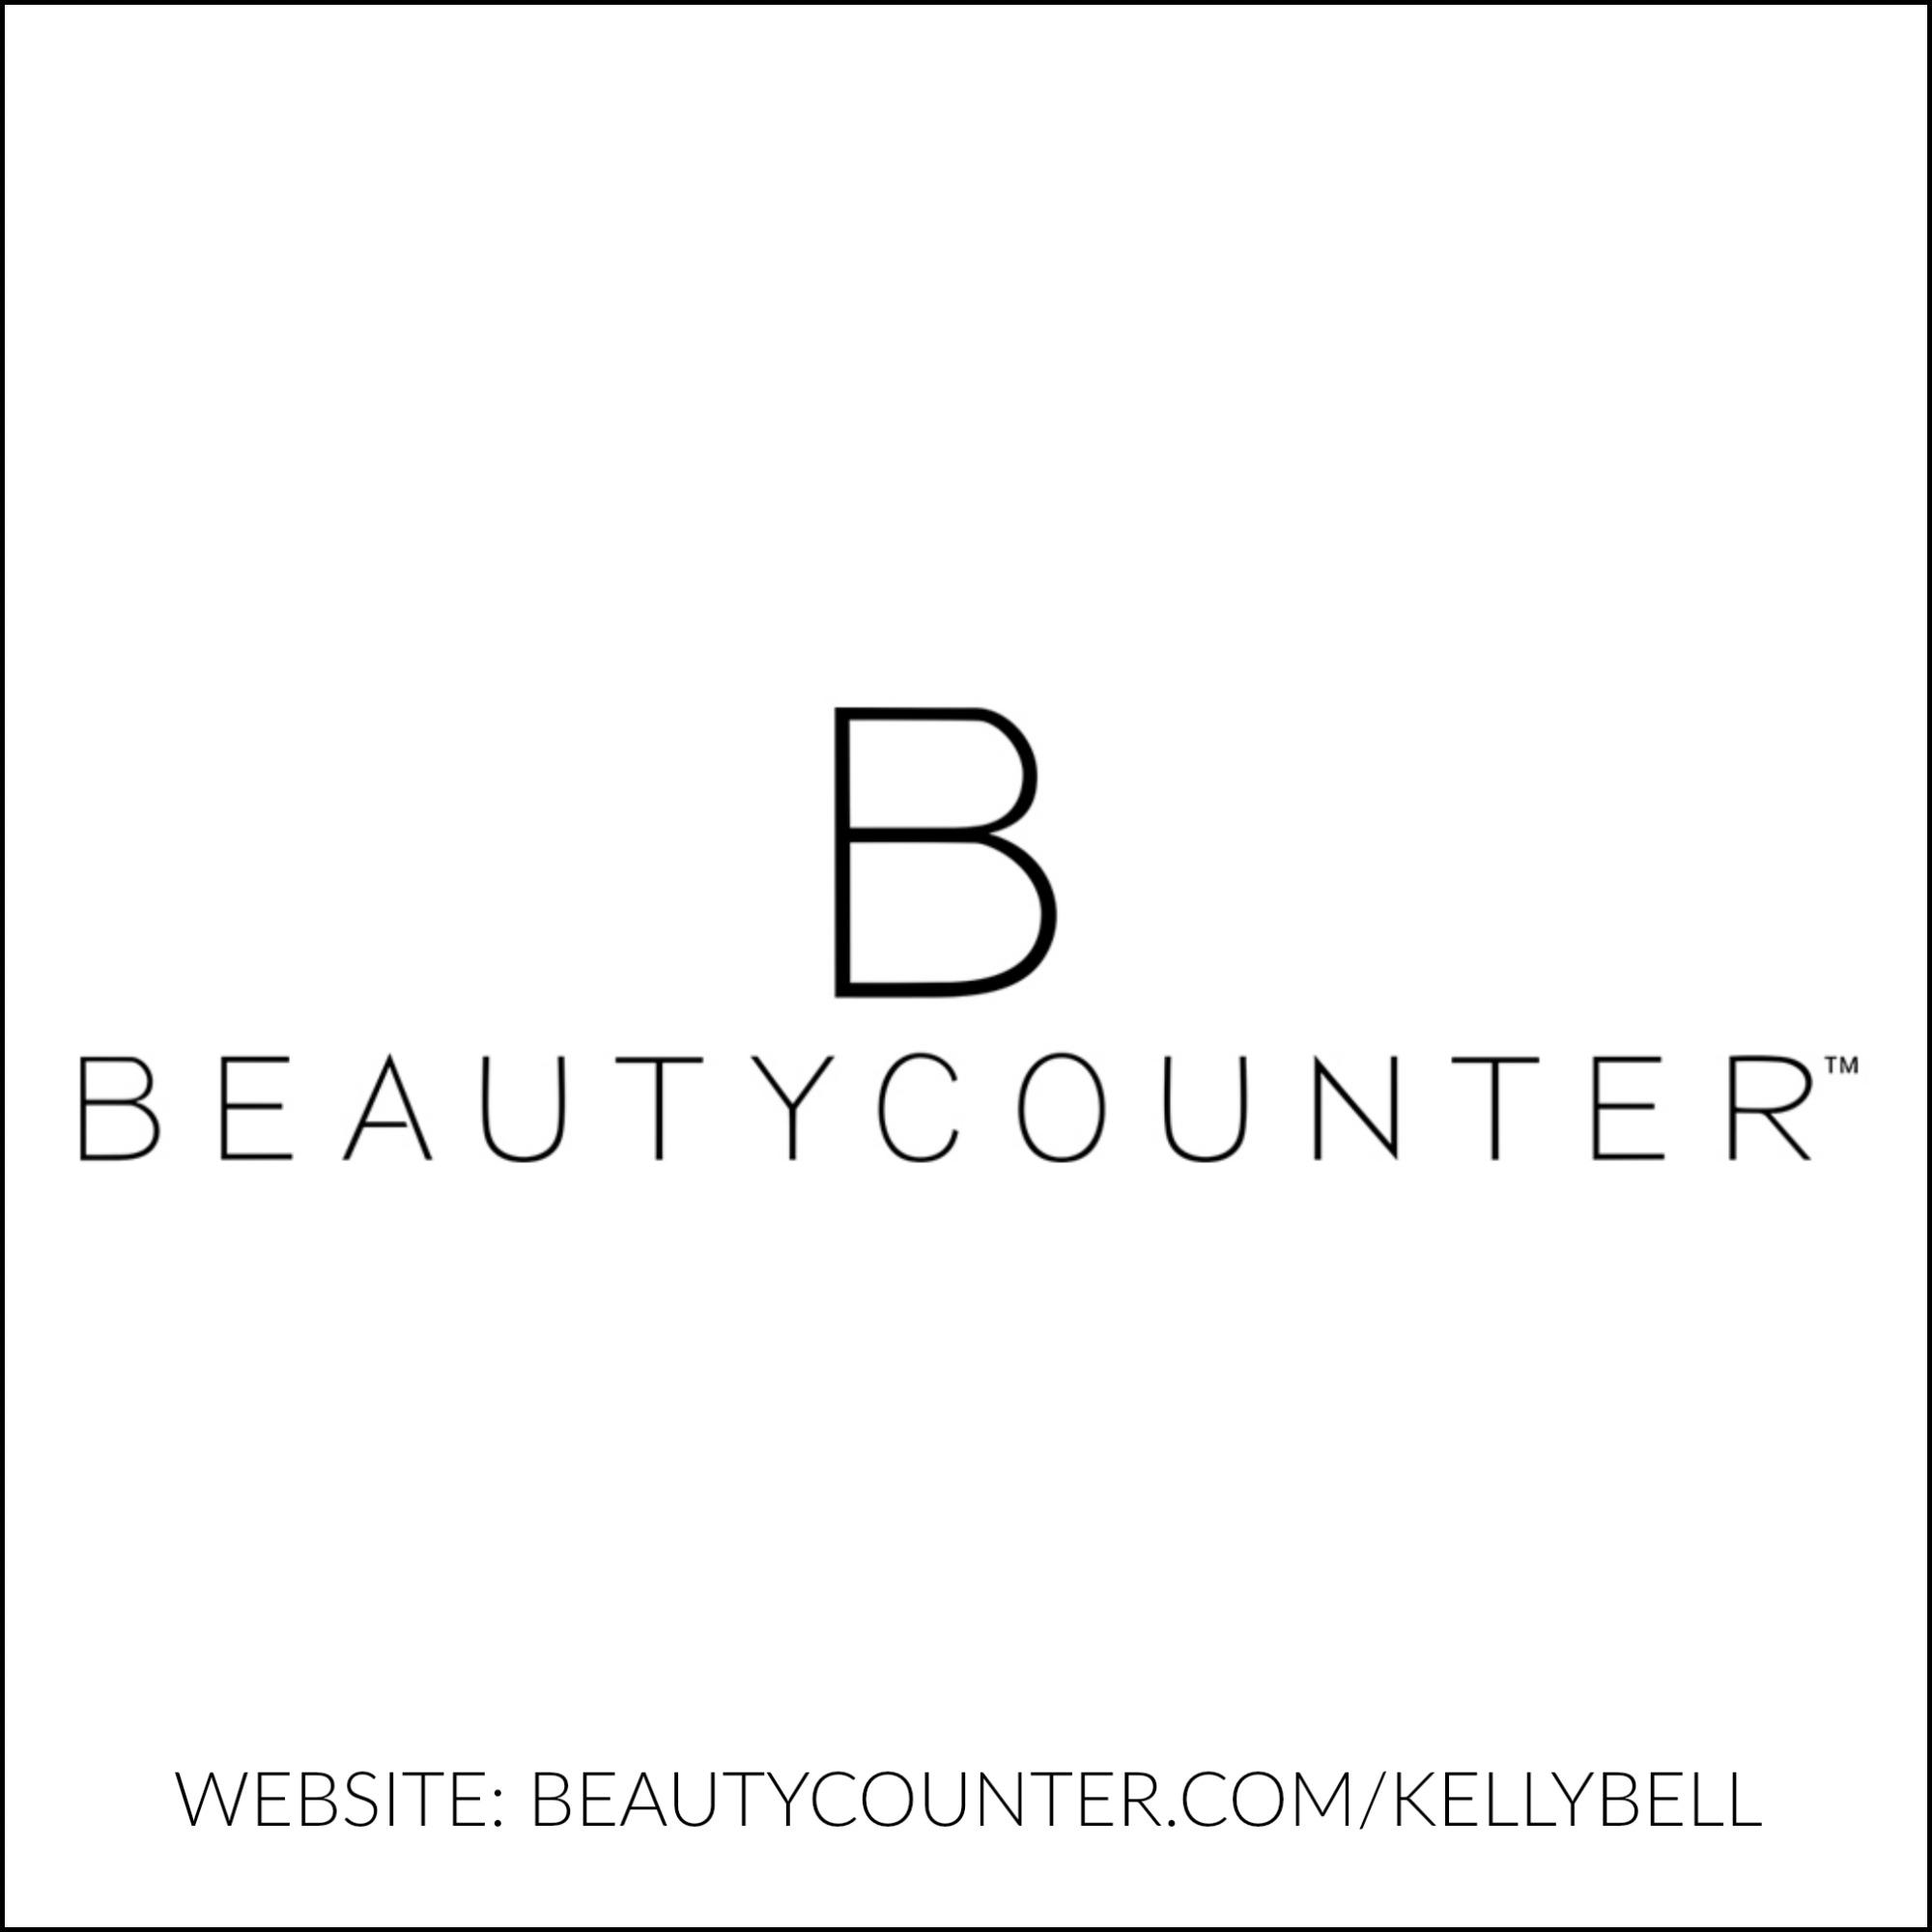 beautycounter.com/kellybell